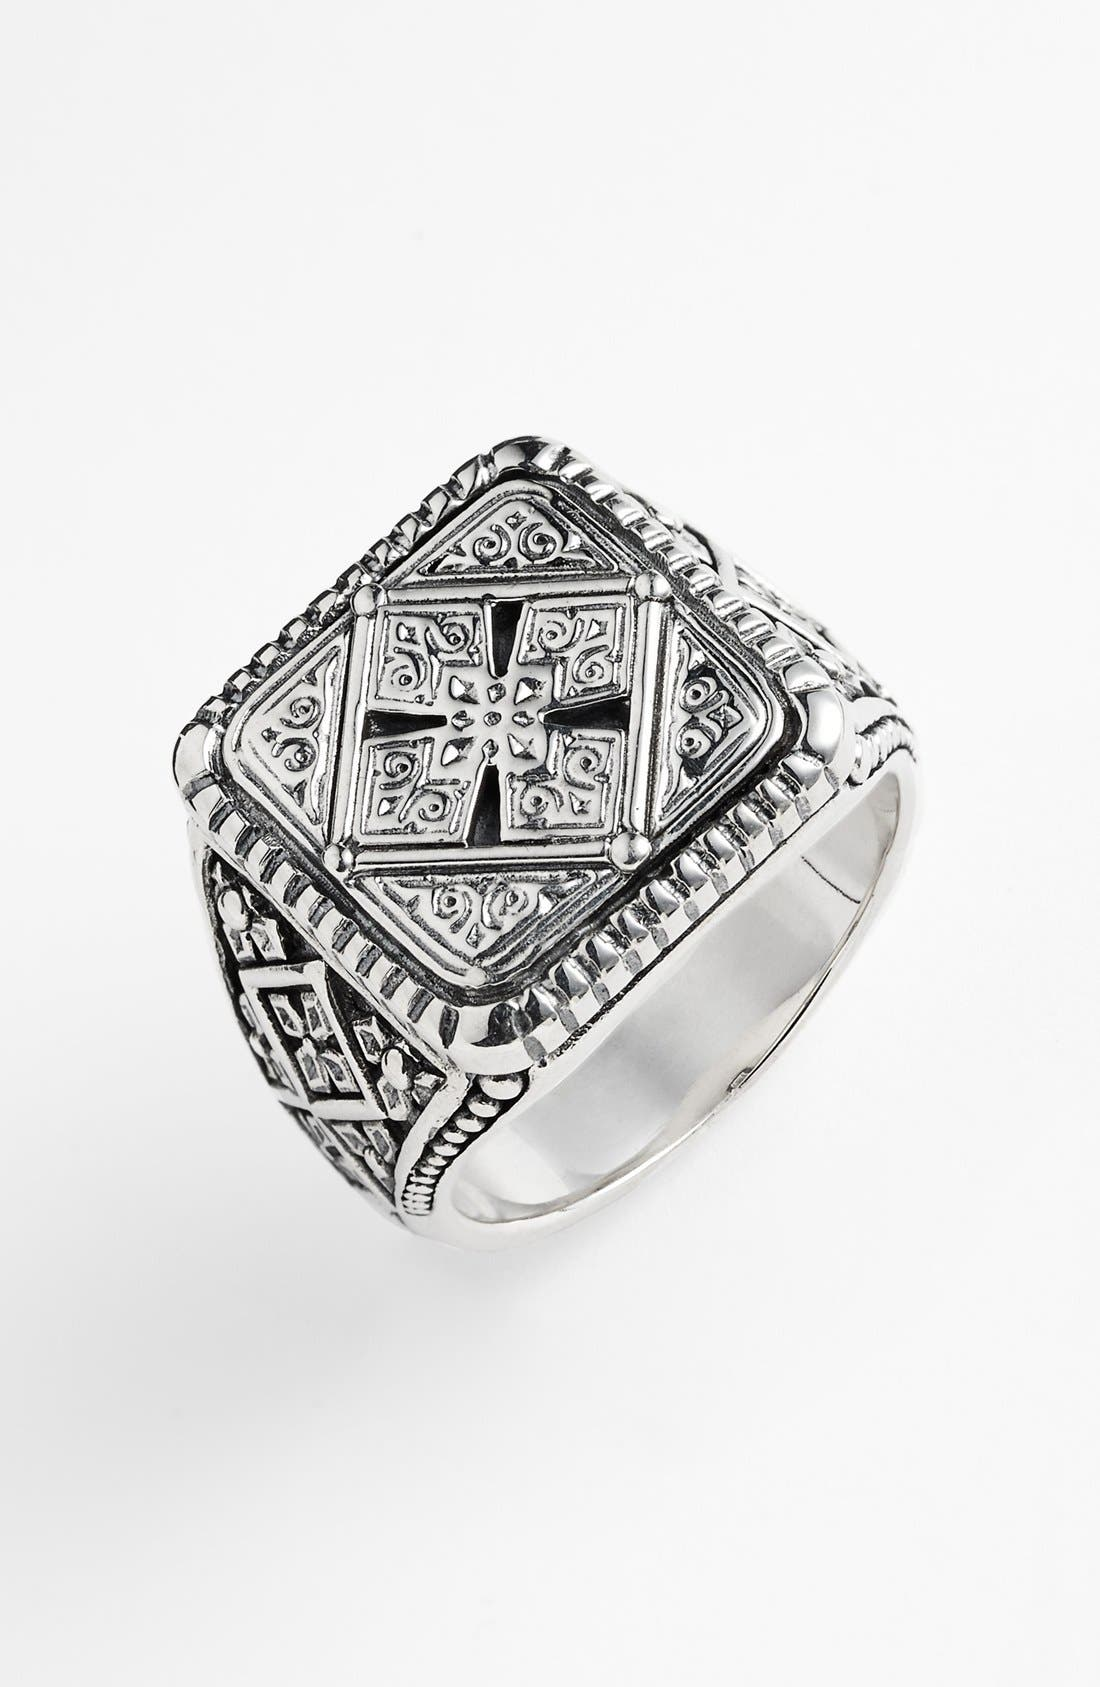 Alternate Image 1 Selected - Konstantino 'Classics' Cross Square Ring